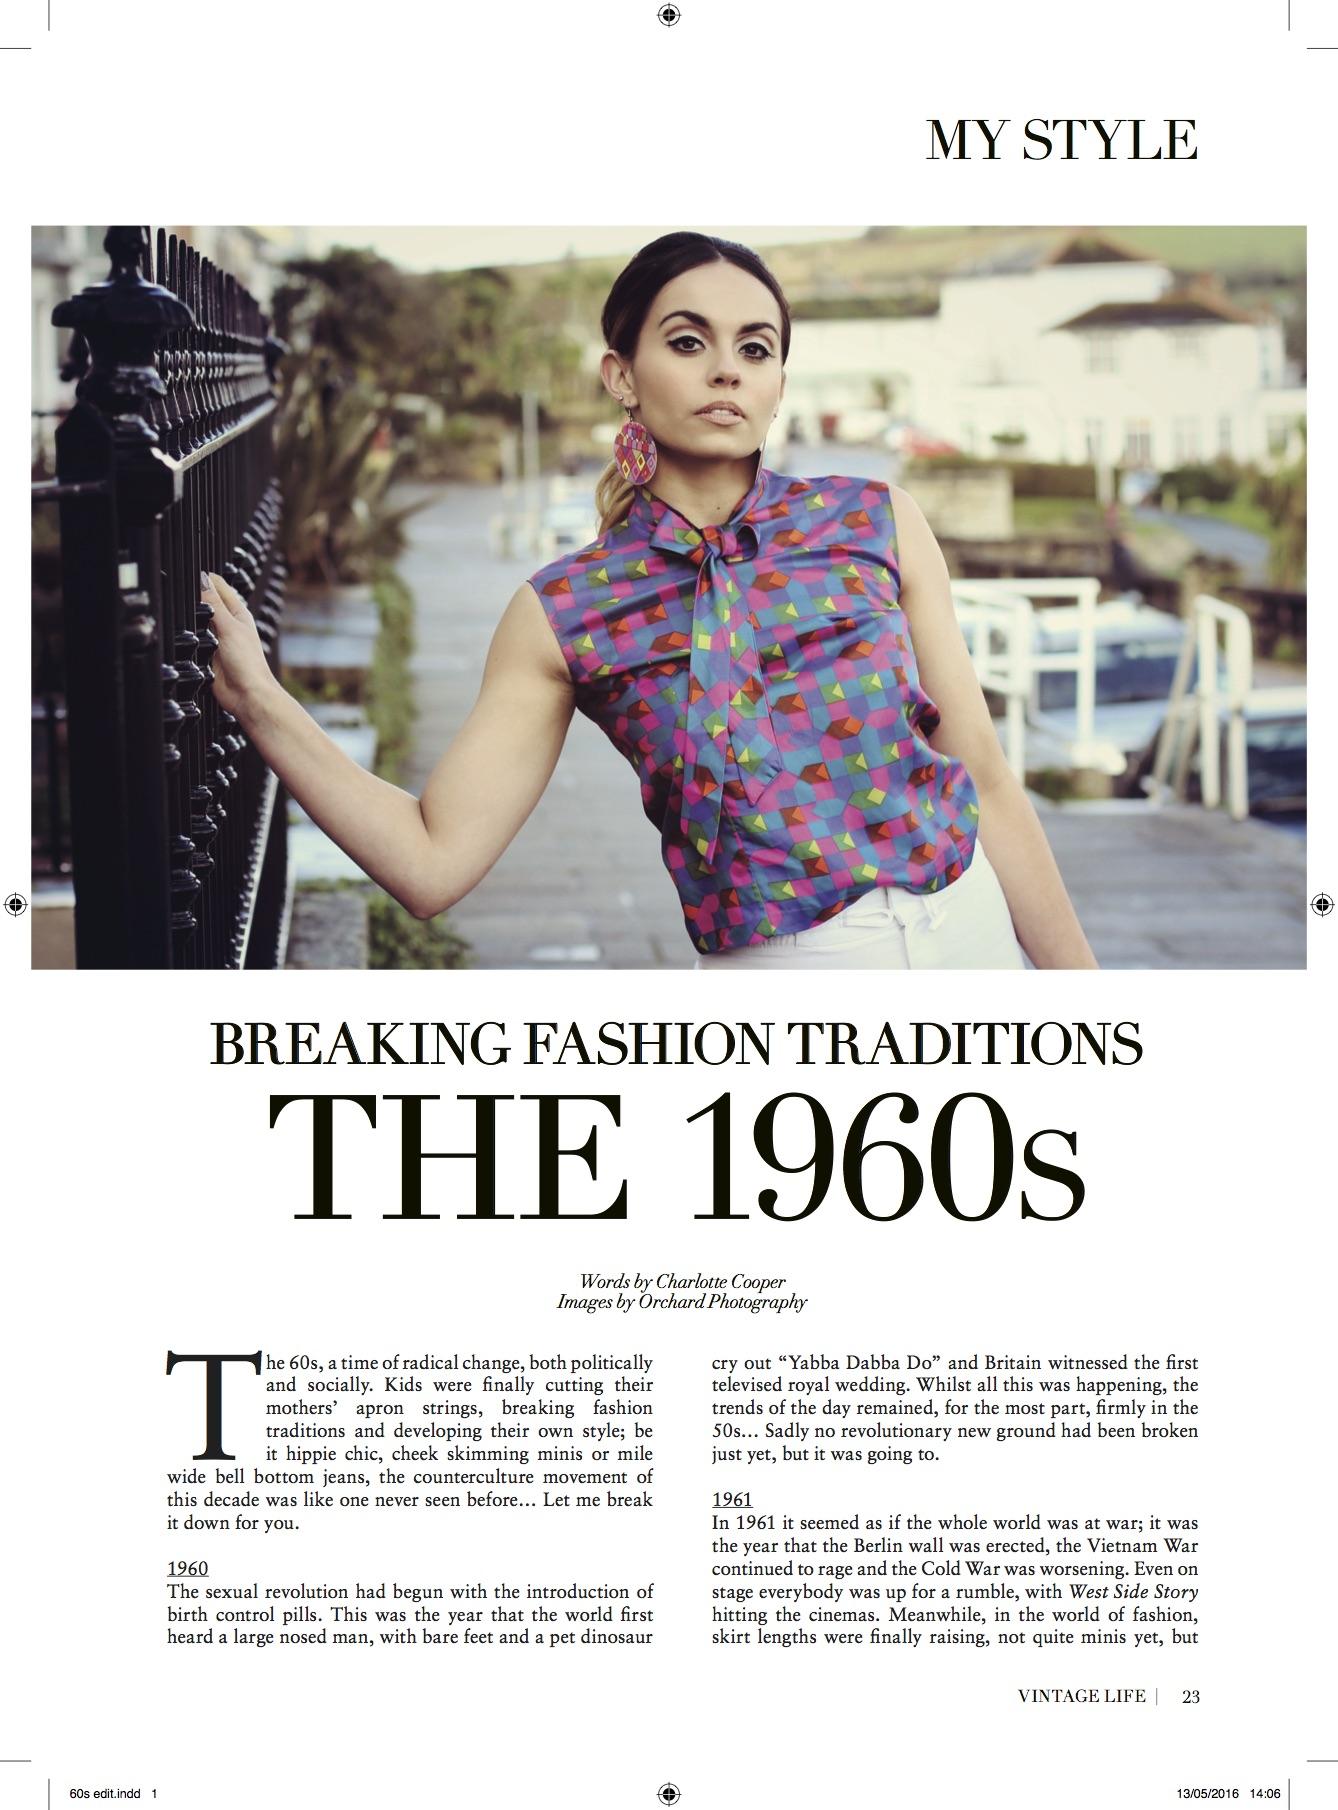 vintage life, magazine editorial